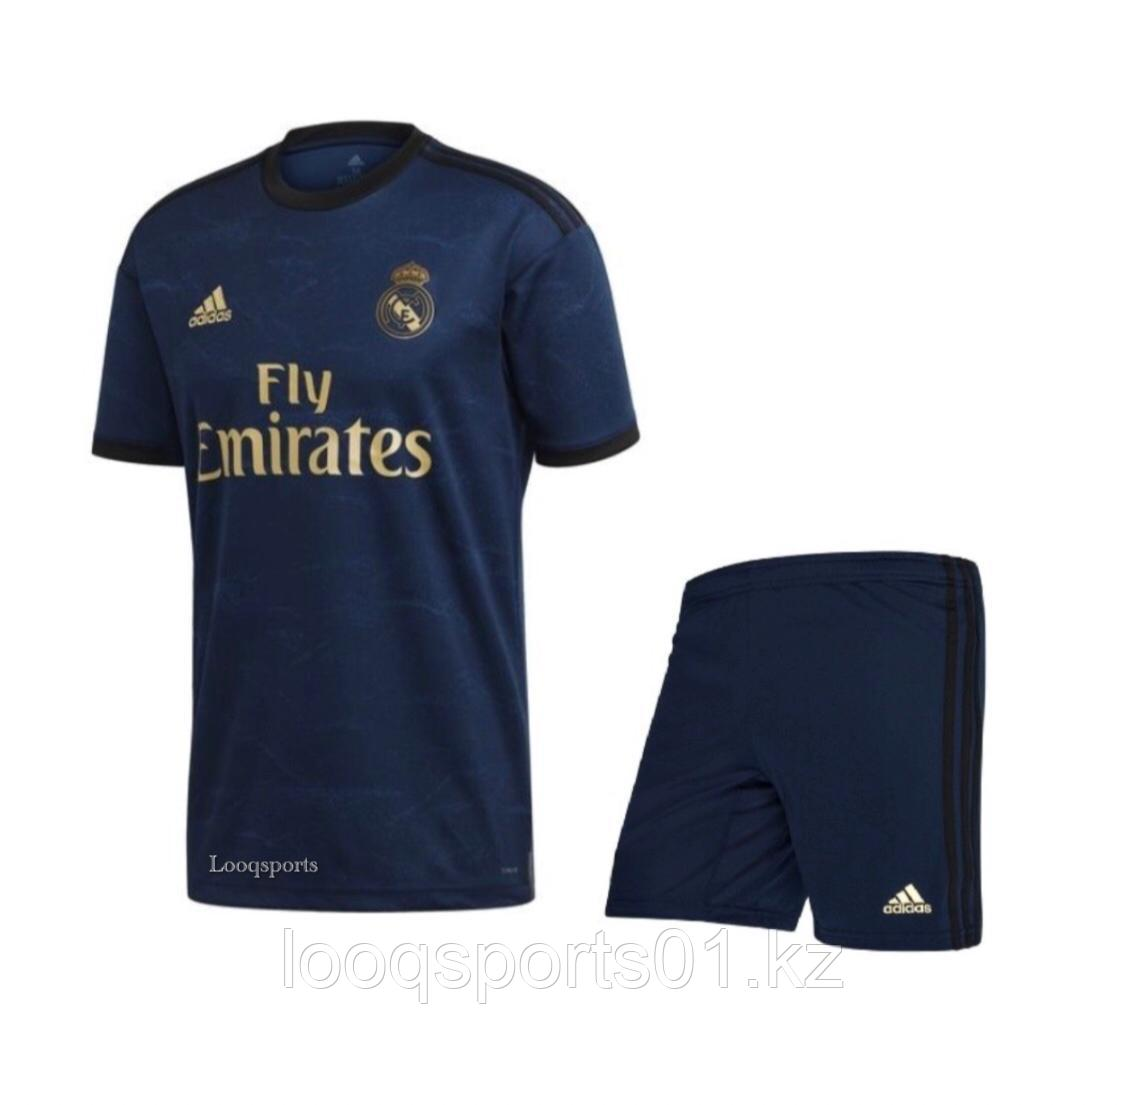 Футбольная форма 19/20 Реал Мадрид гостевая (Real Madrid)